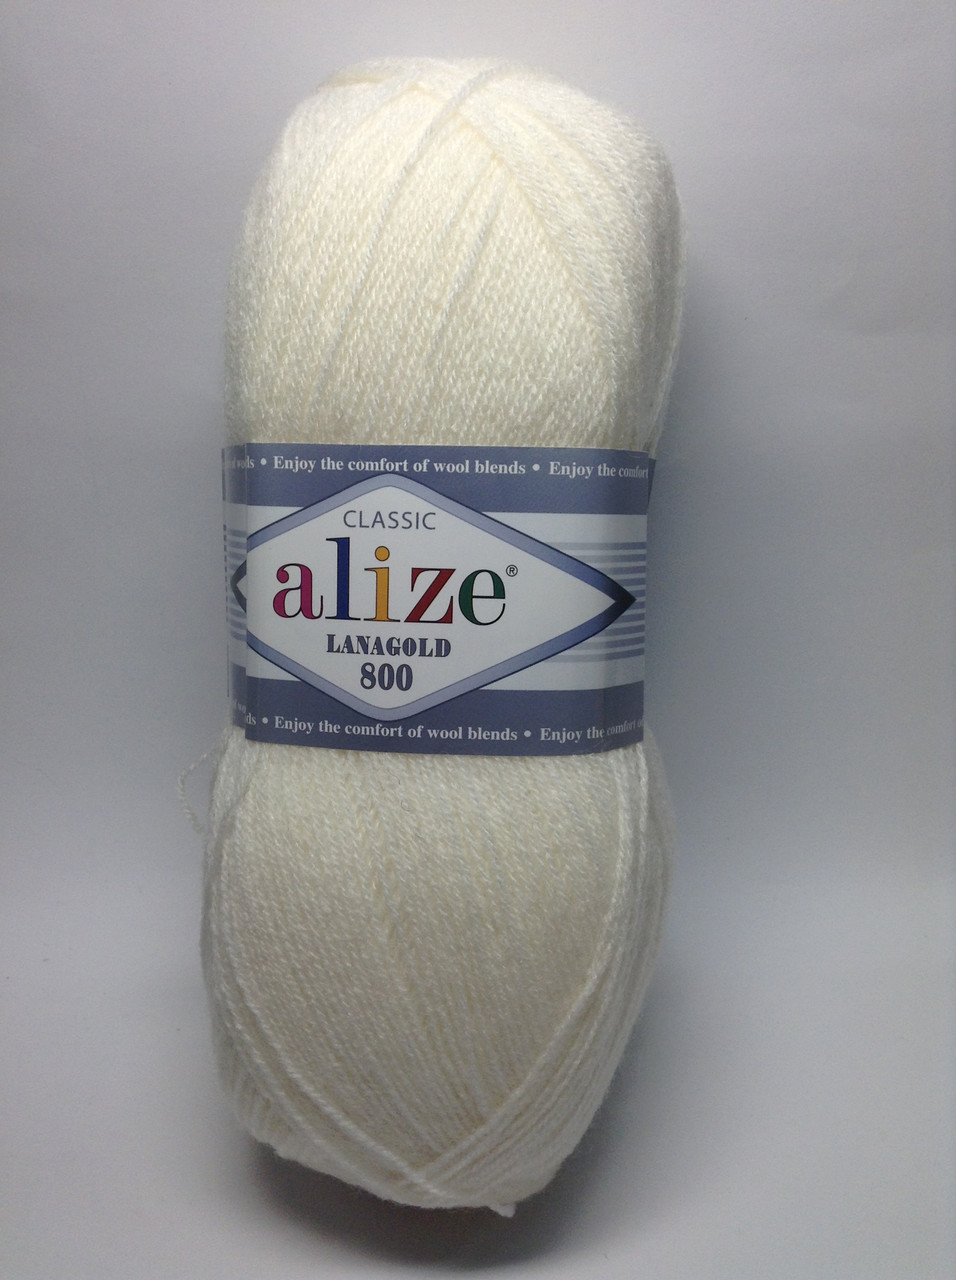 Пряжа lana gold 800 - цвет белый